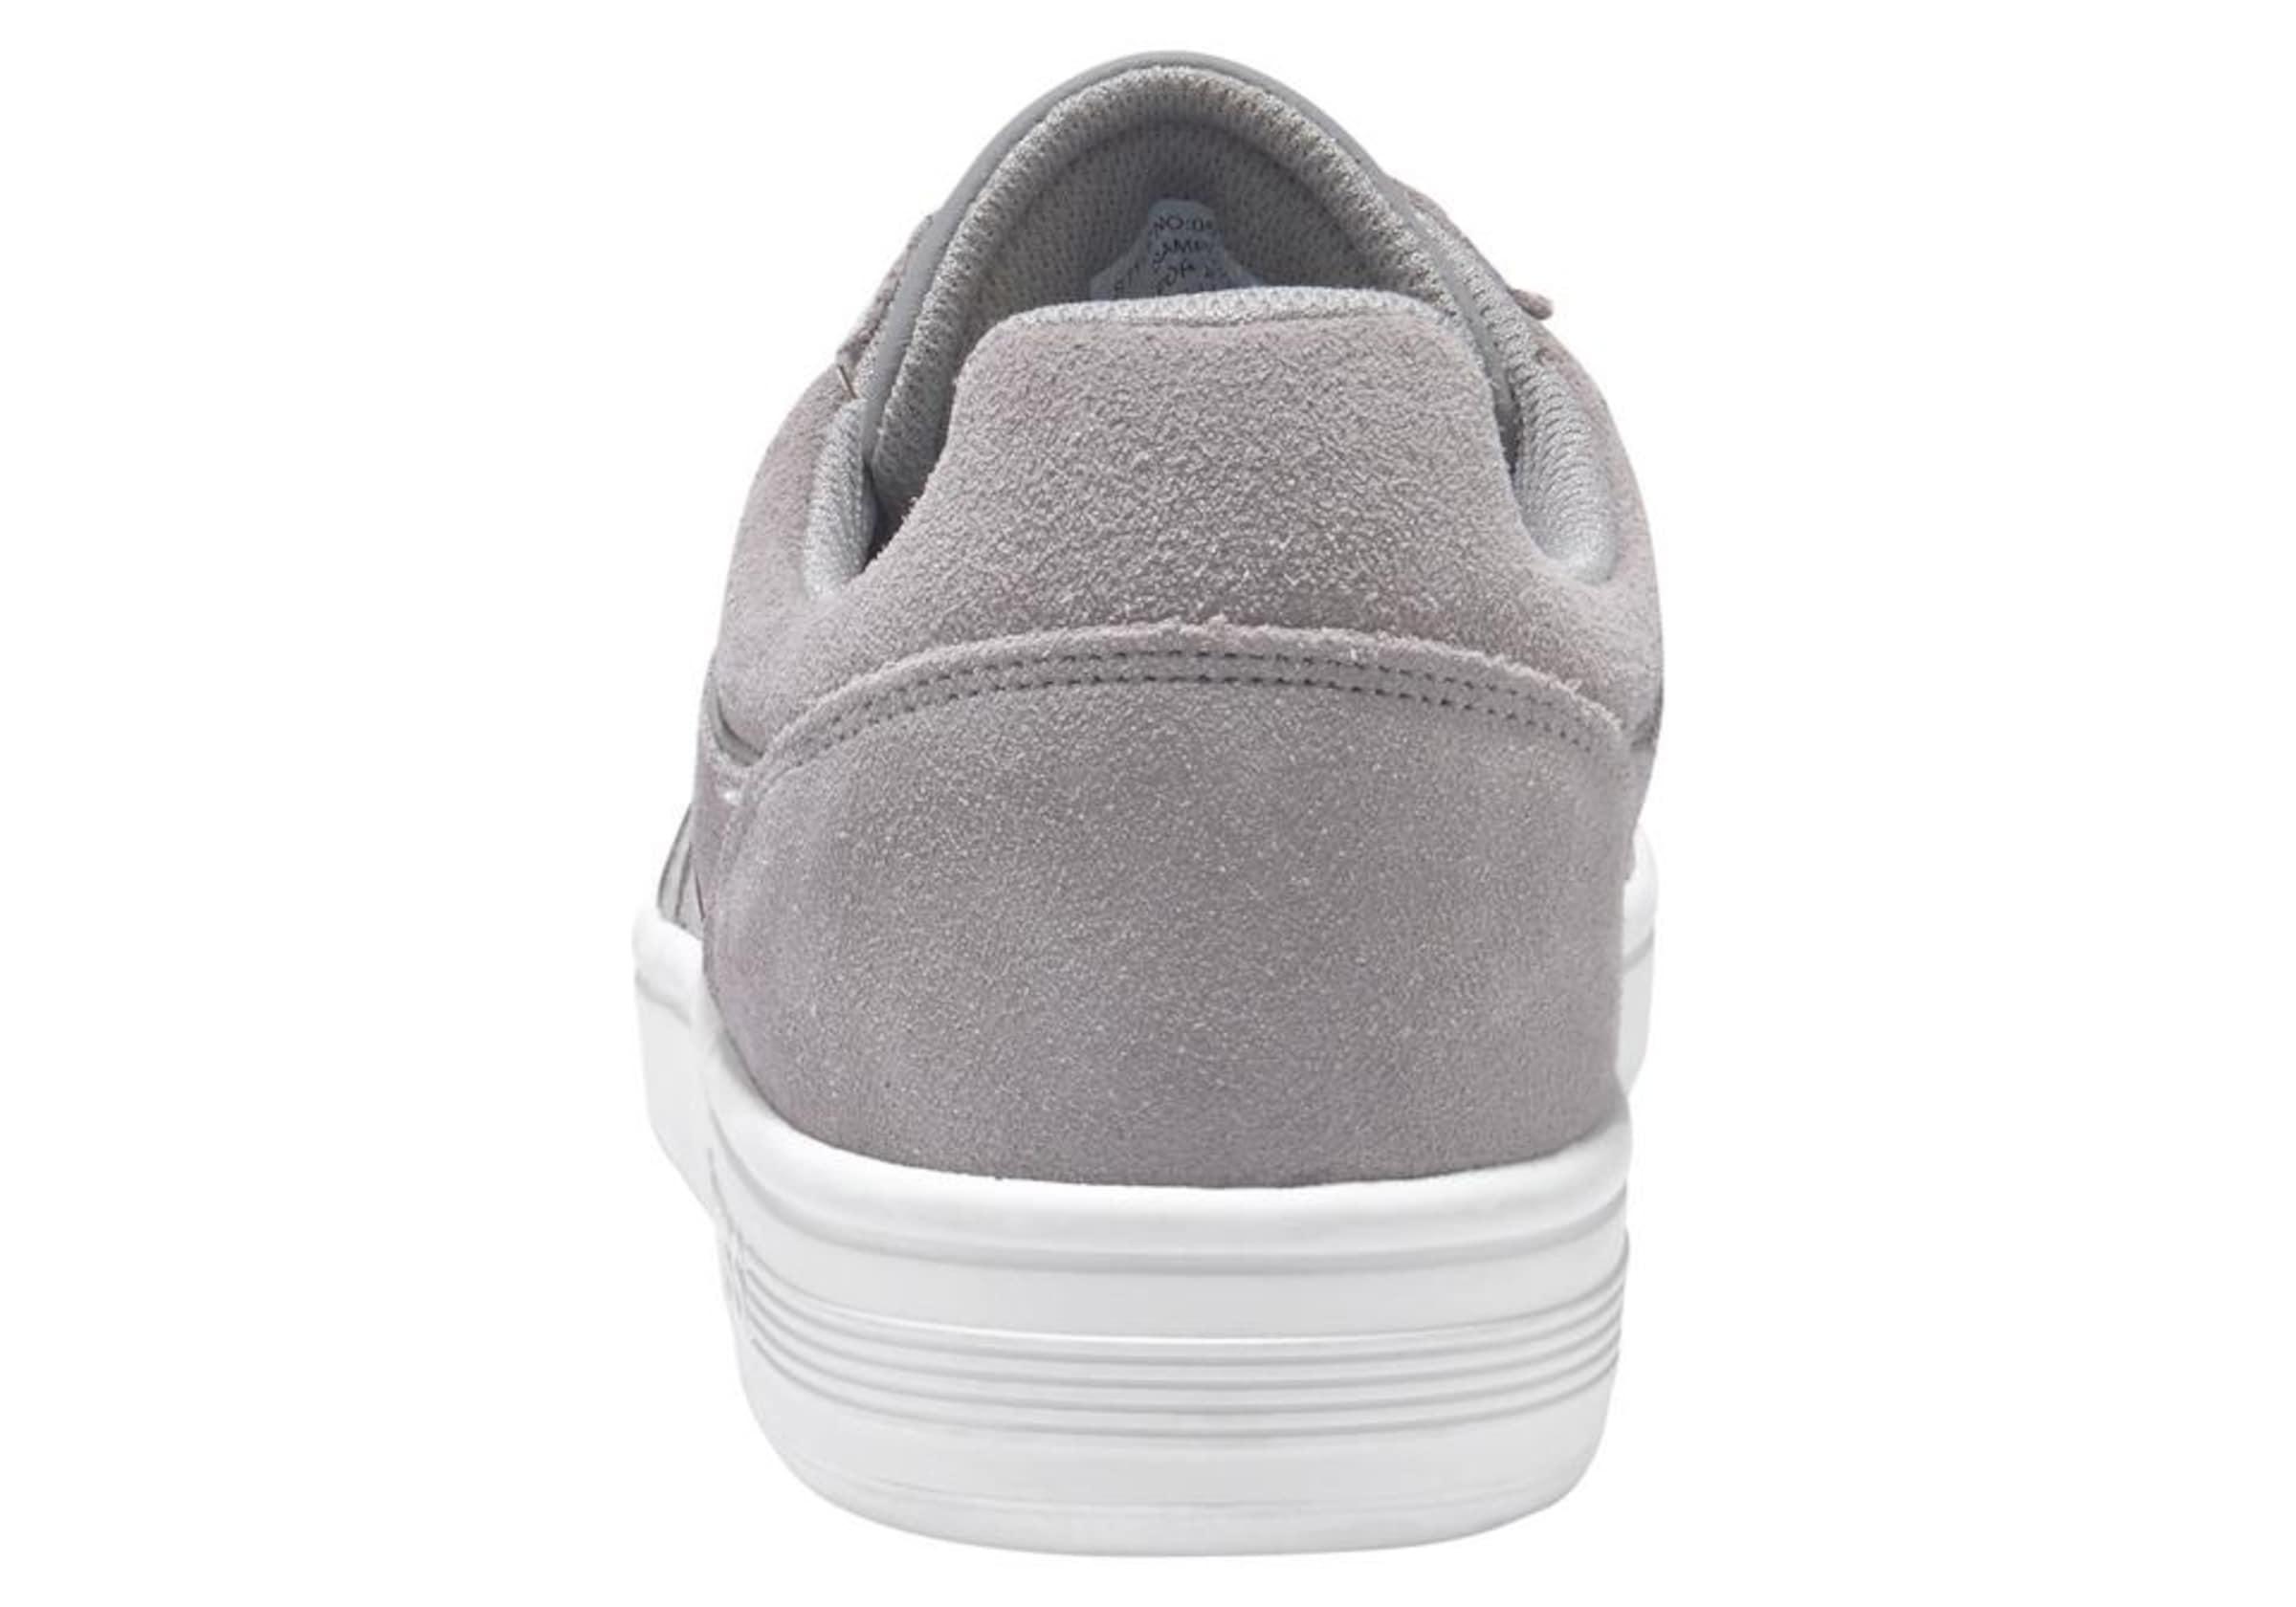 swiss Sneaker In Weiß Cheswick 'court K Suede' GrauHellgrau MzqUVpS